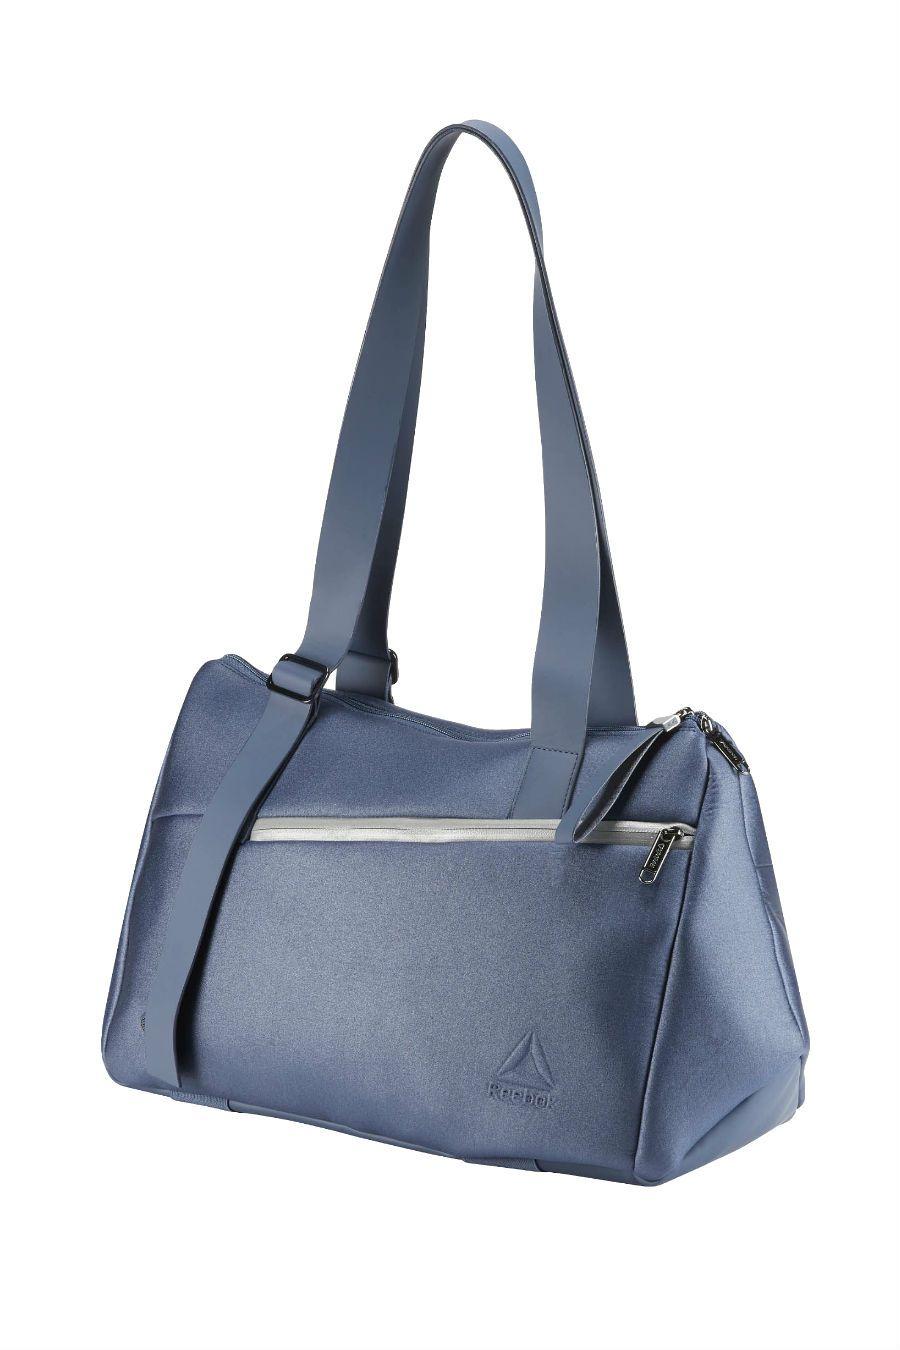 A blue Reebok gym bag